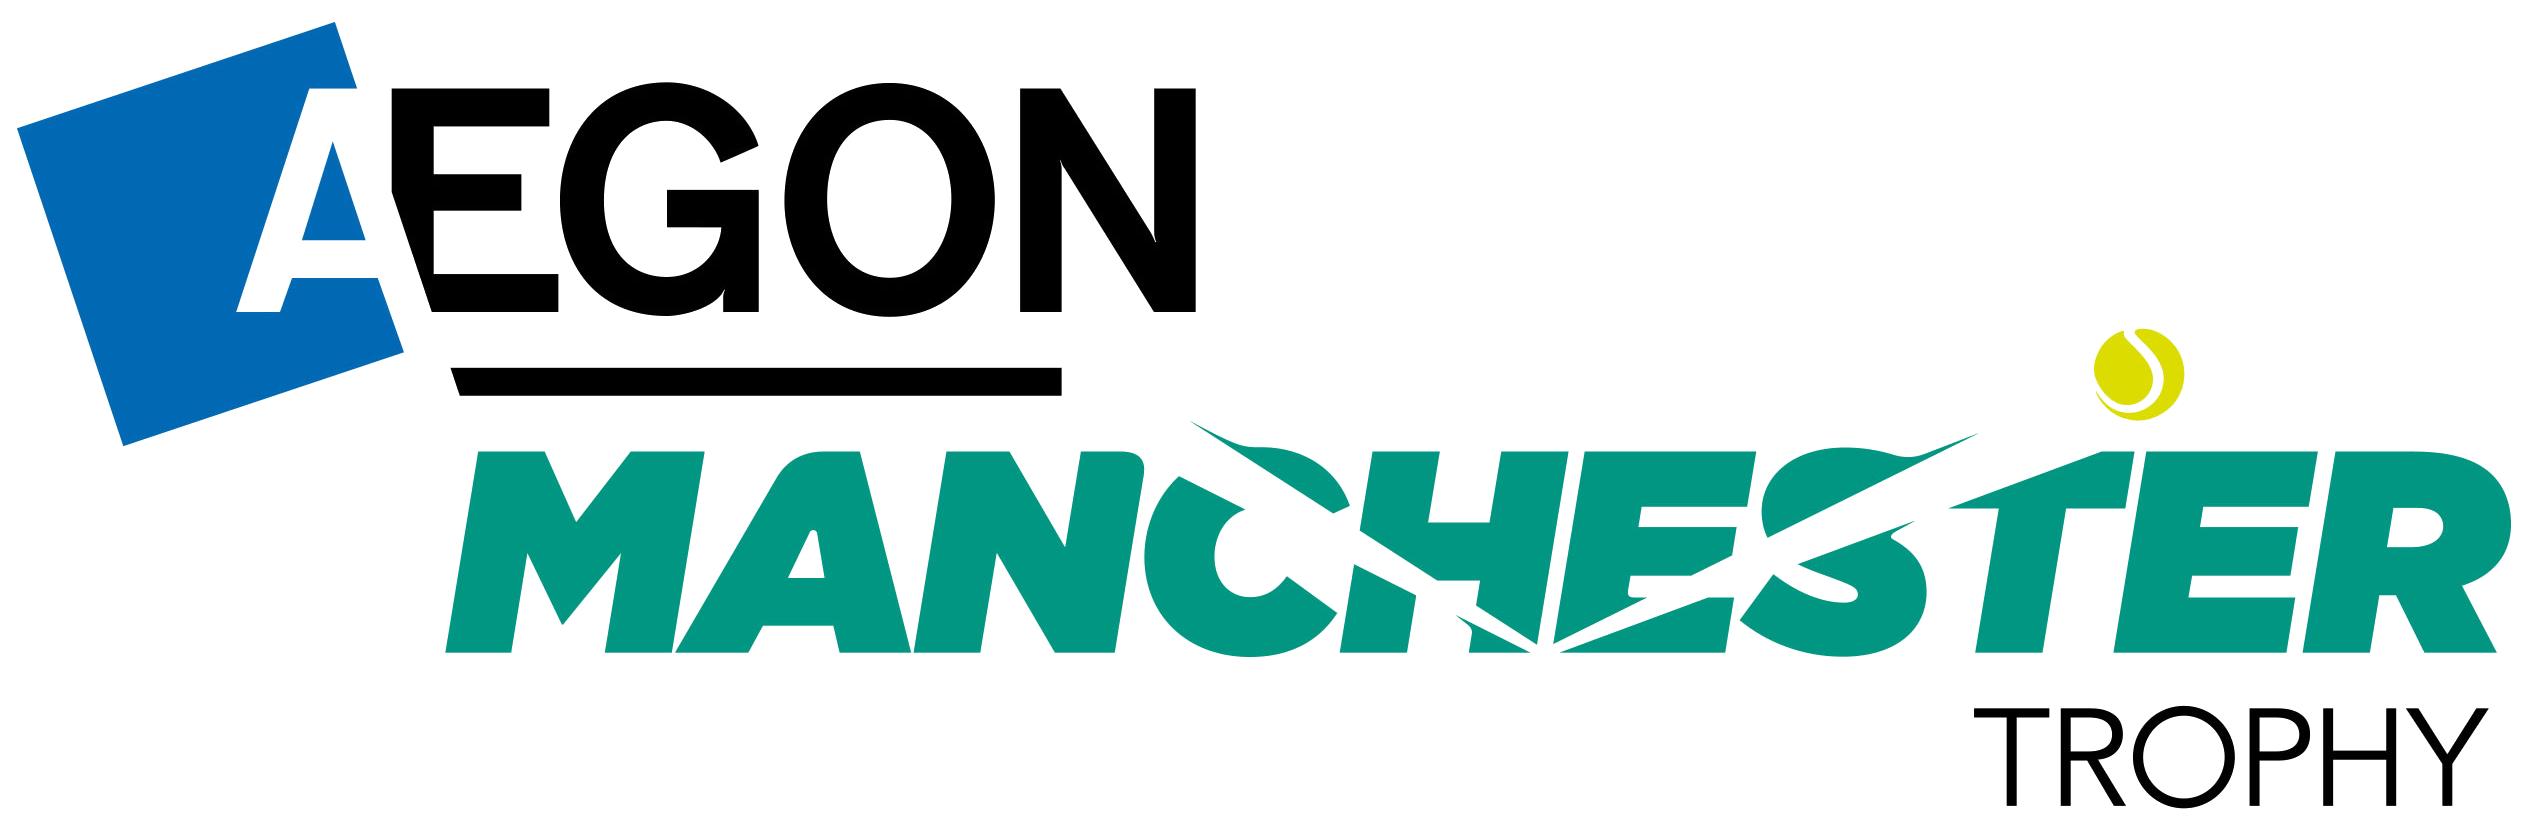 aegon manchester trophy logo